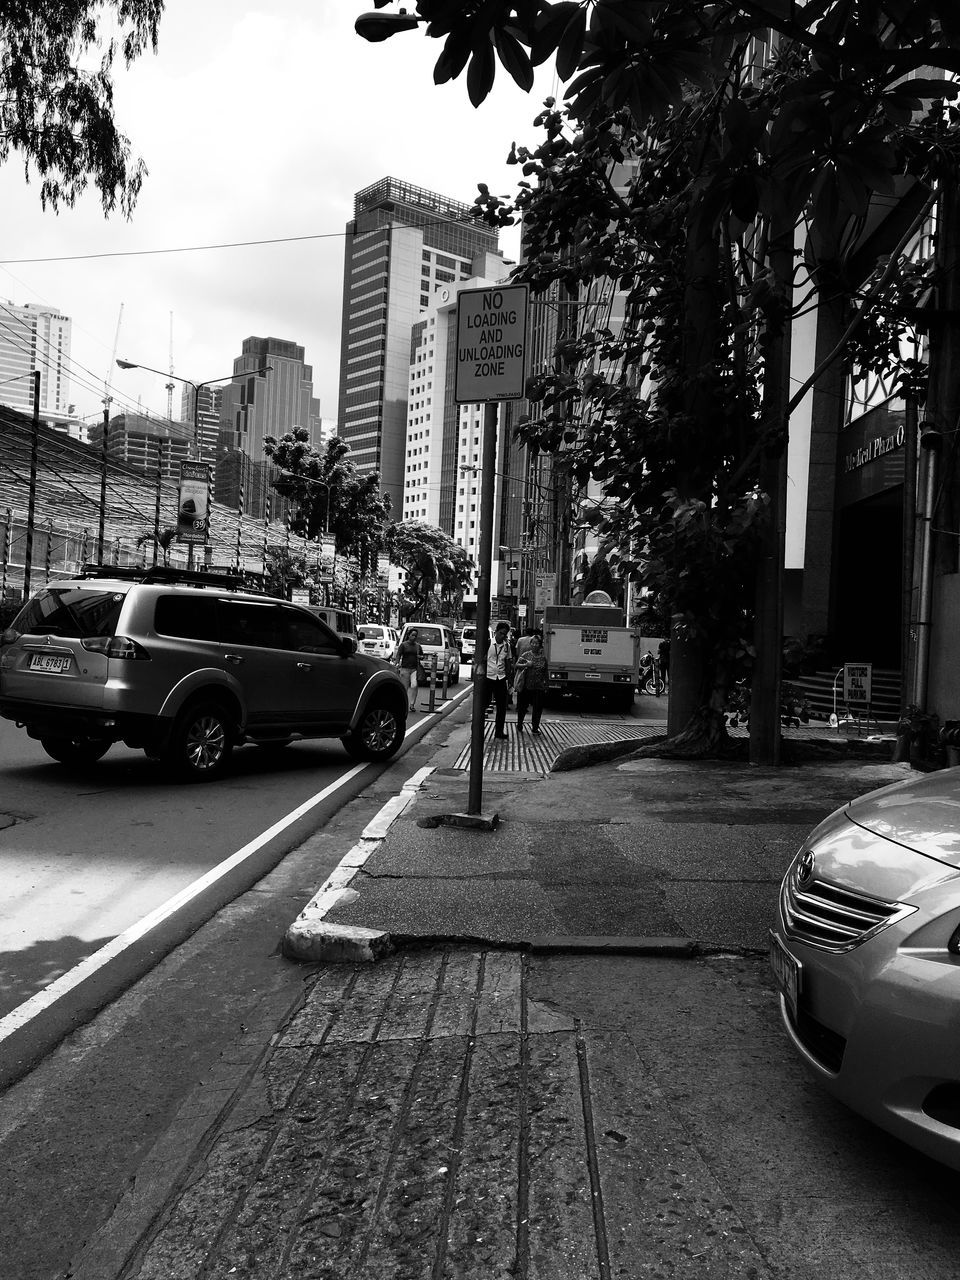 CITY STREET BY BUILDINGS